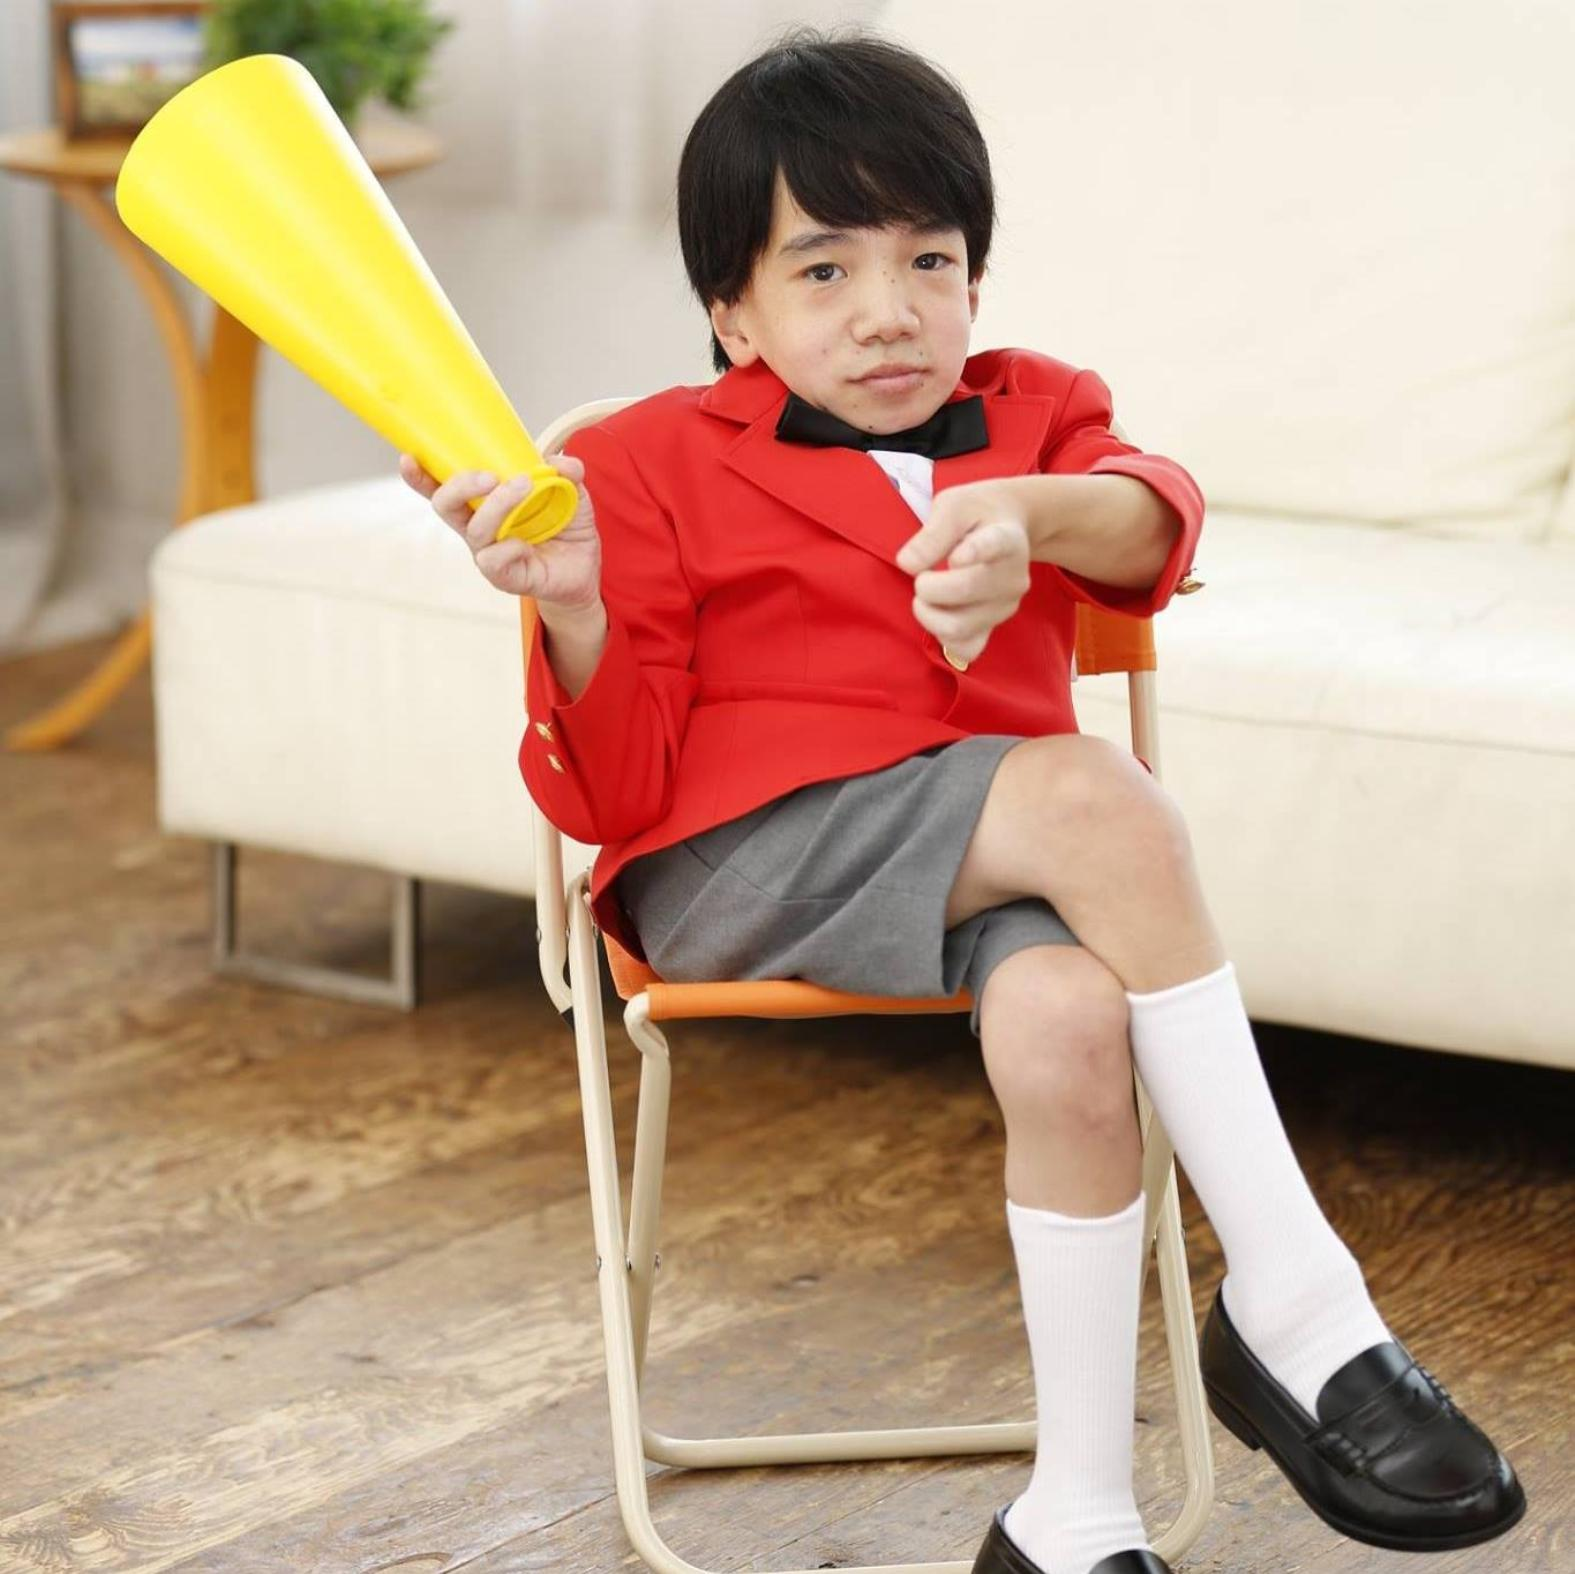 japanese child looks like a child